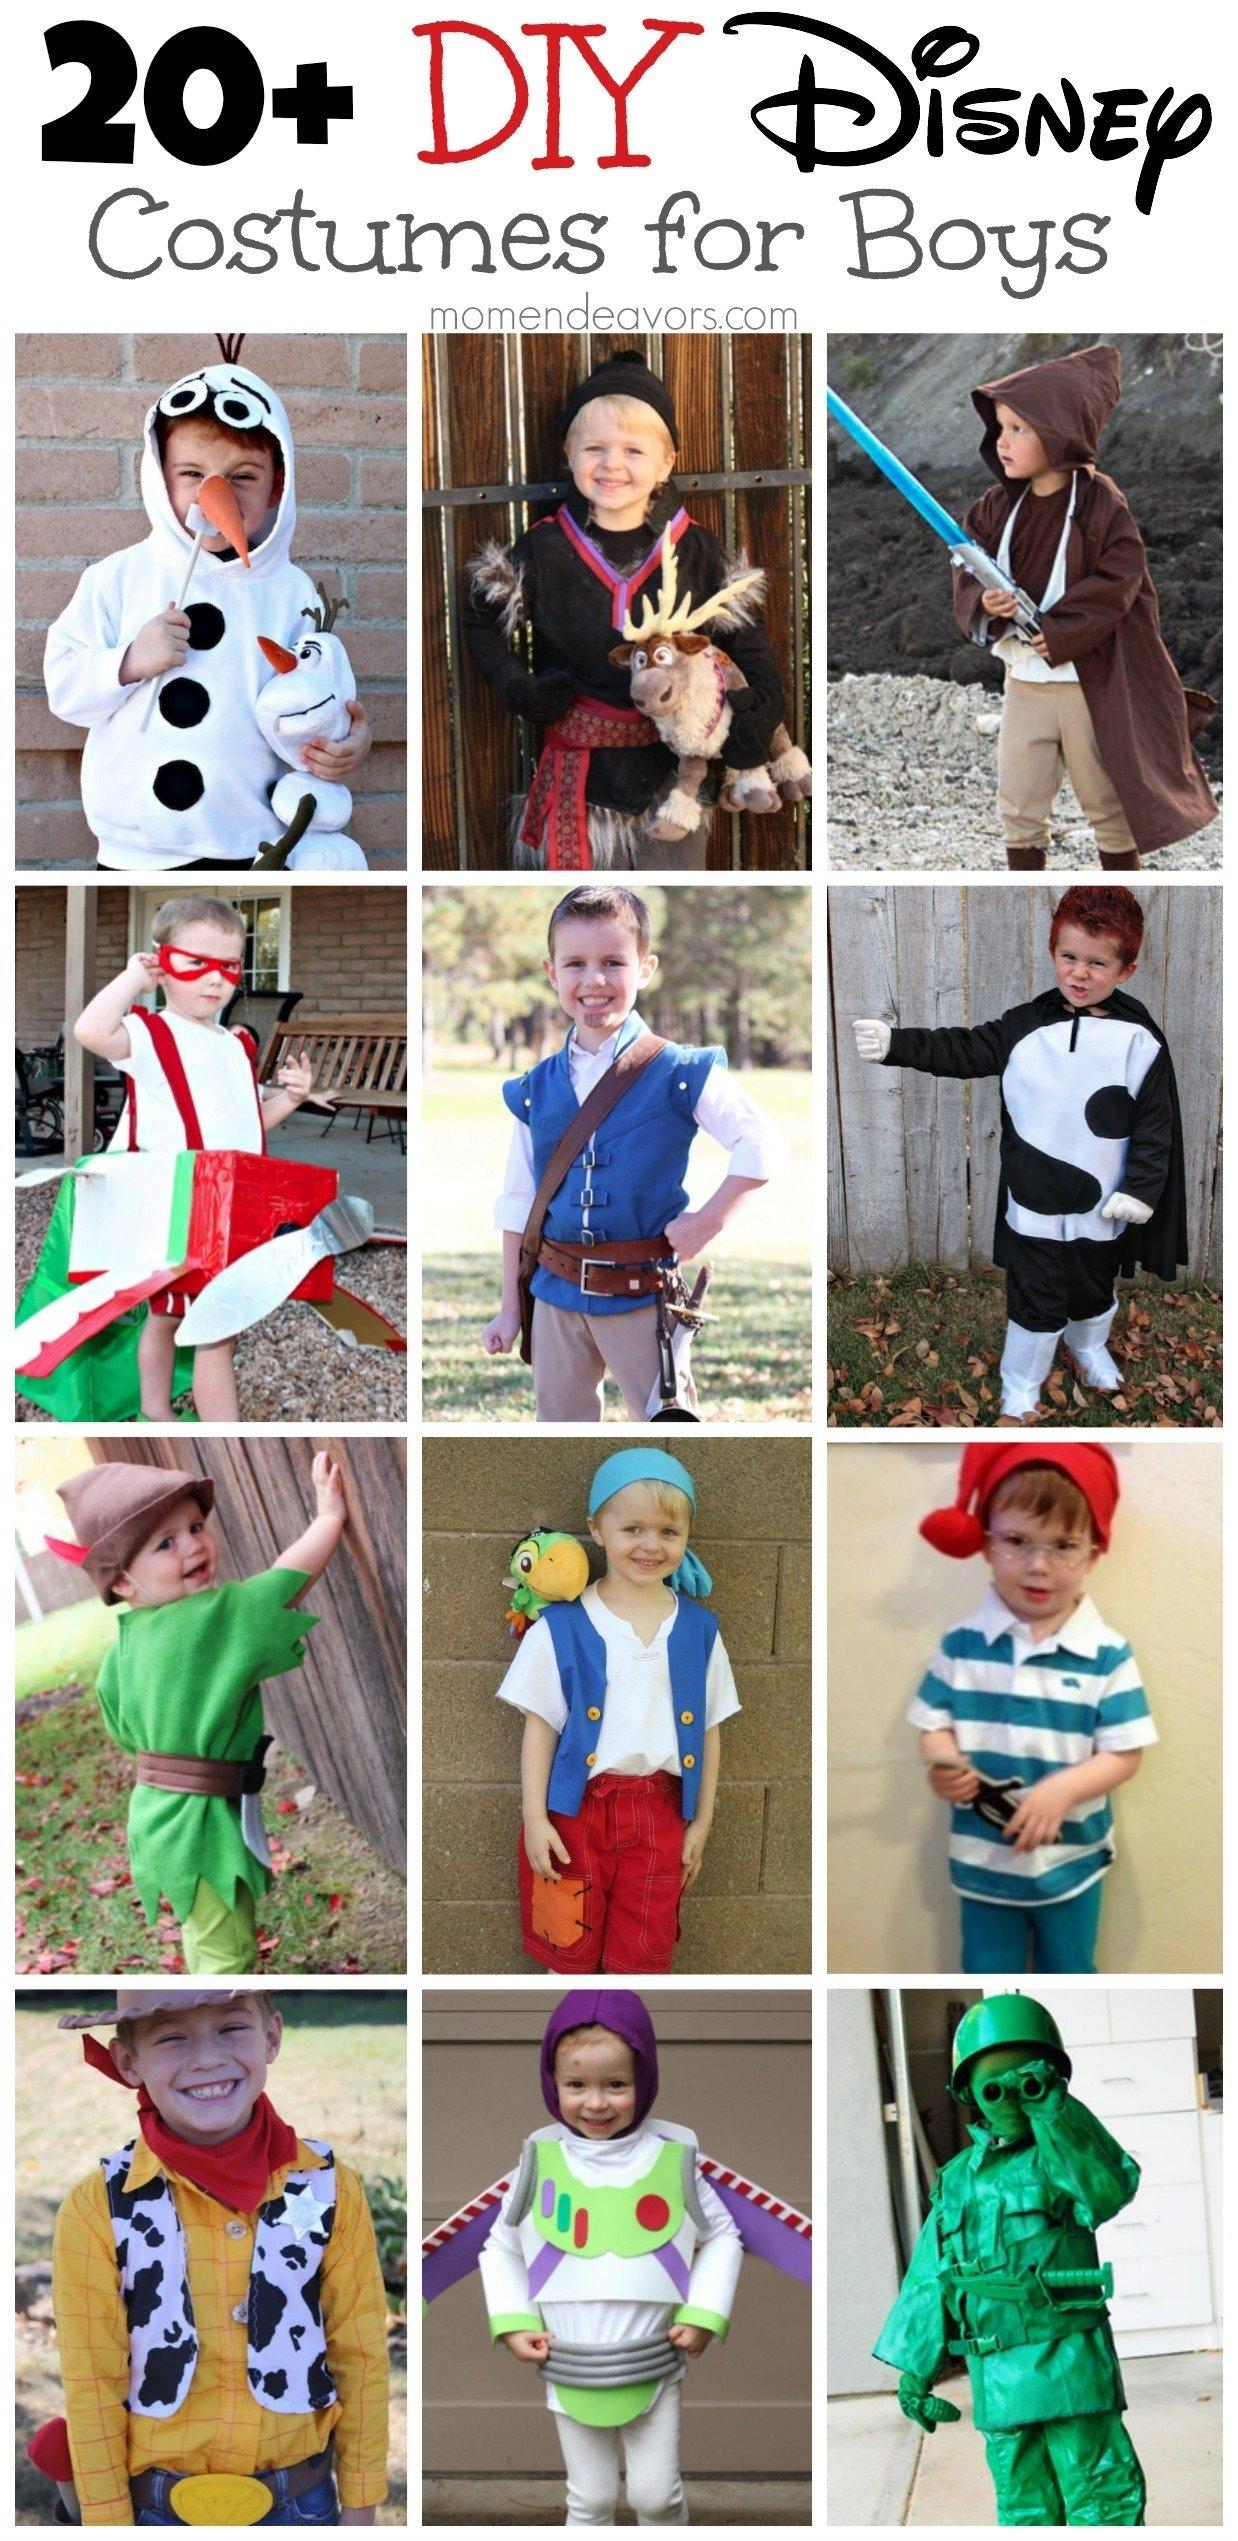 10 Beautiful Disney Character Dress Up Ideas diy disney costumes for boys 2020